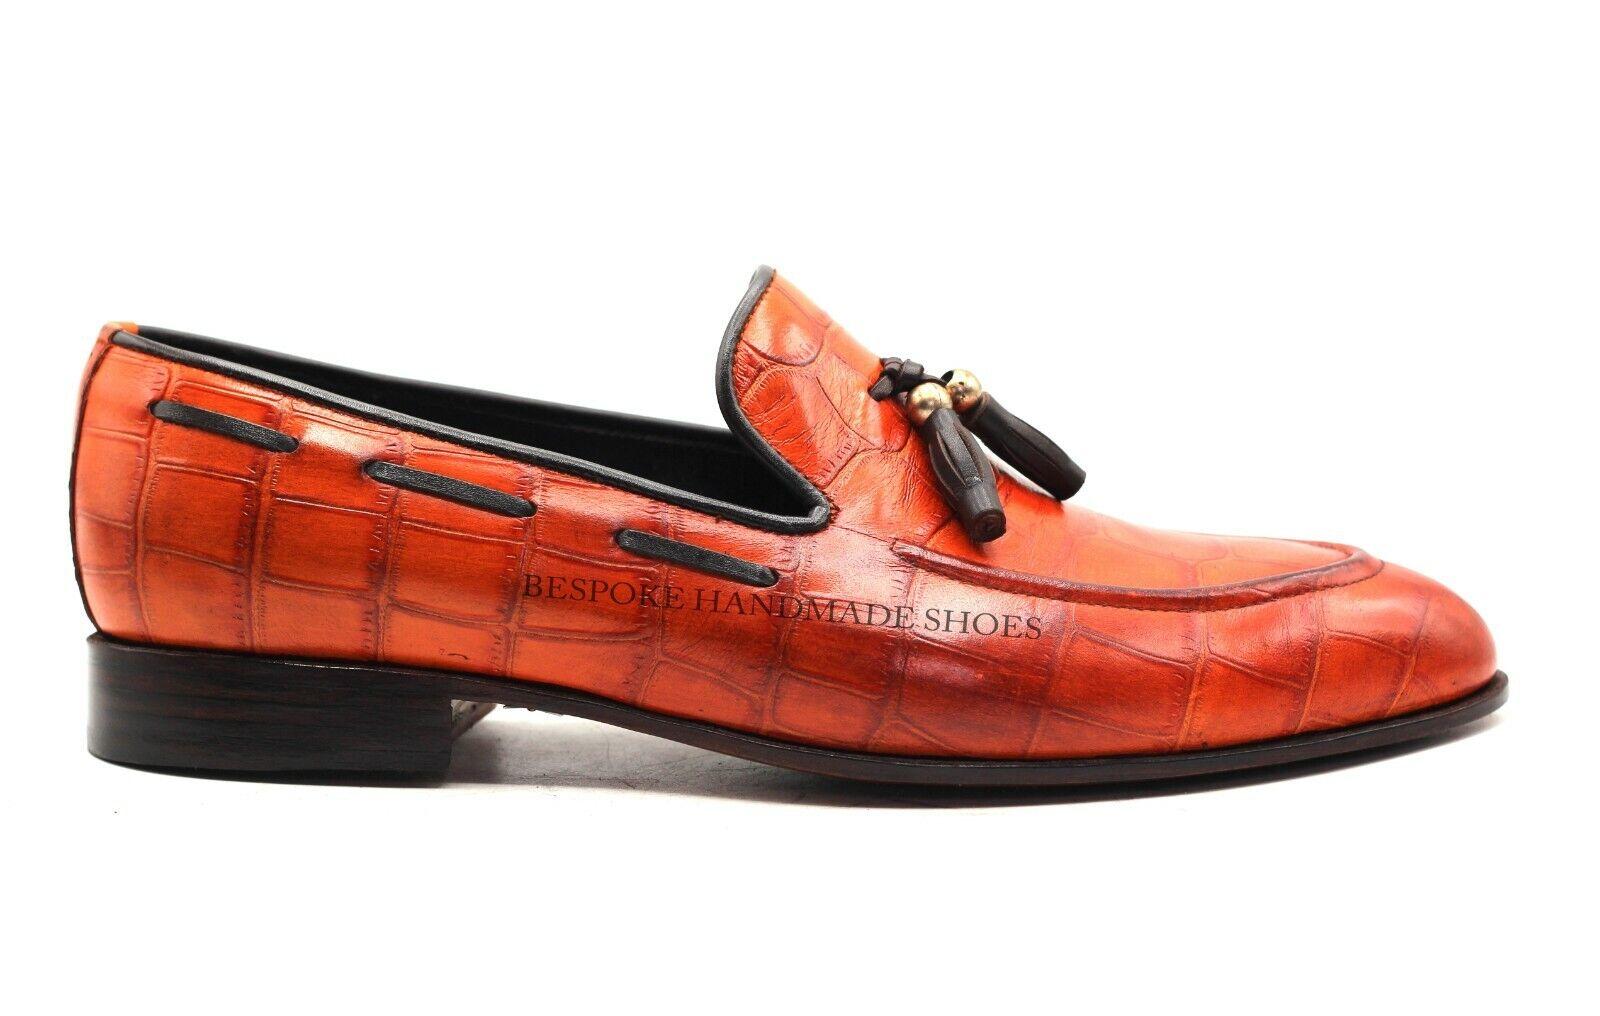 Handgemachte Herren echte Tan Kalbsleder Krokodildruck Slip Ons Schuhe